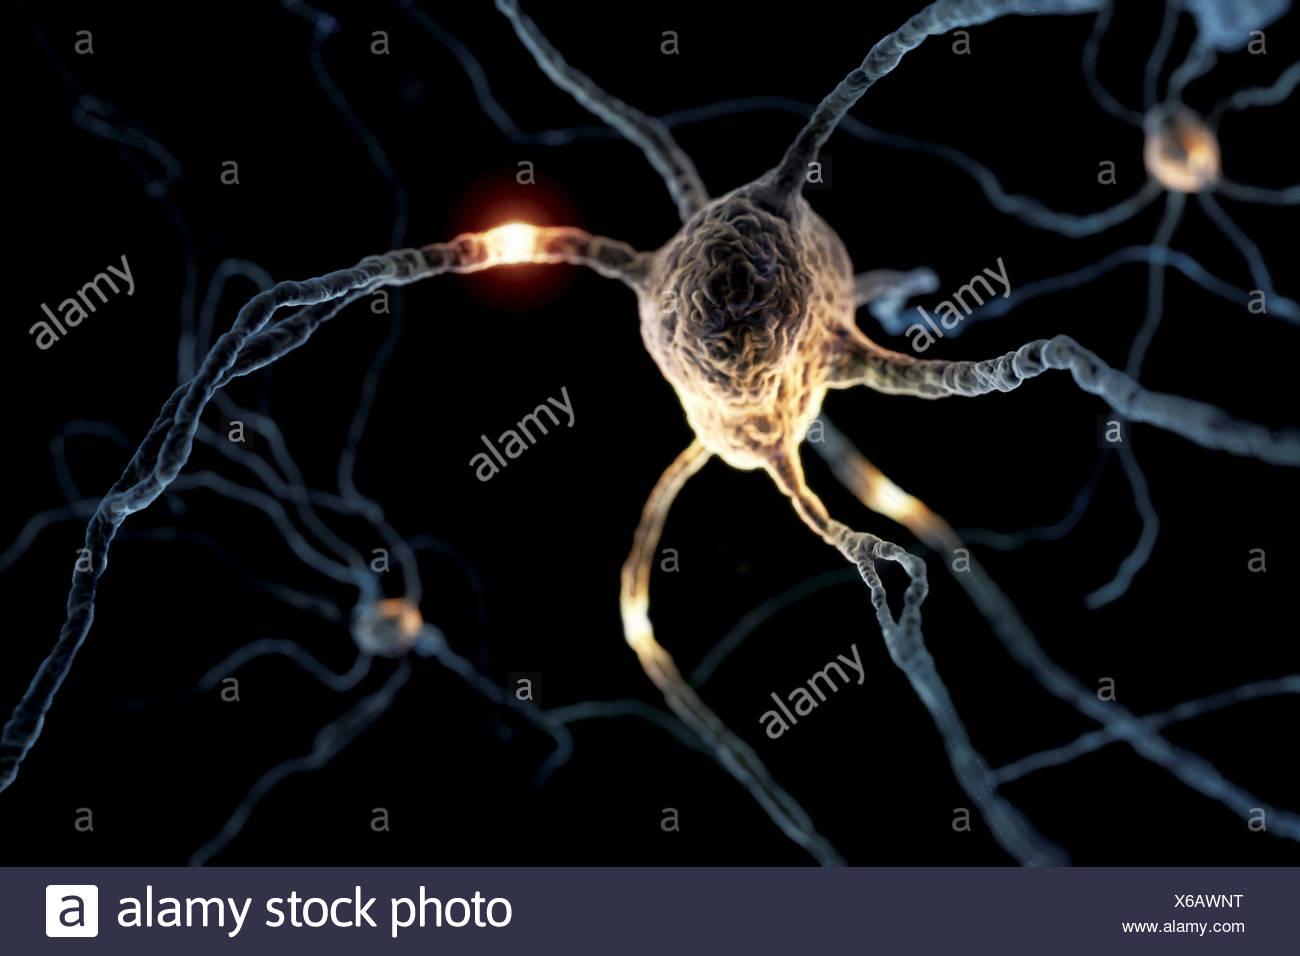 La visualisation de style microscopique des neurones. Photo Stock